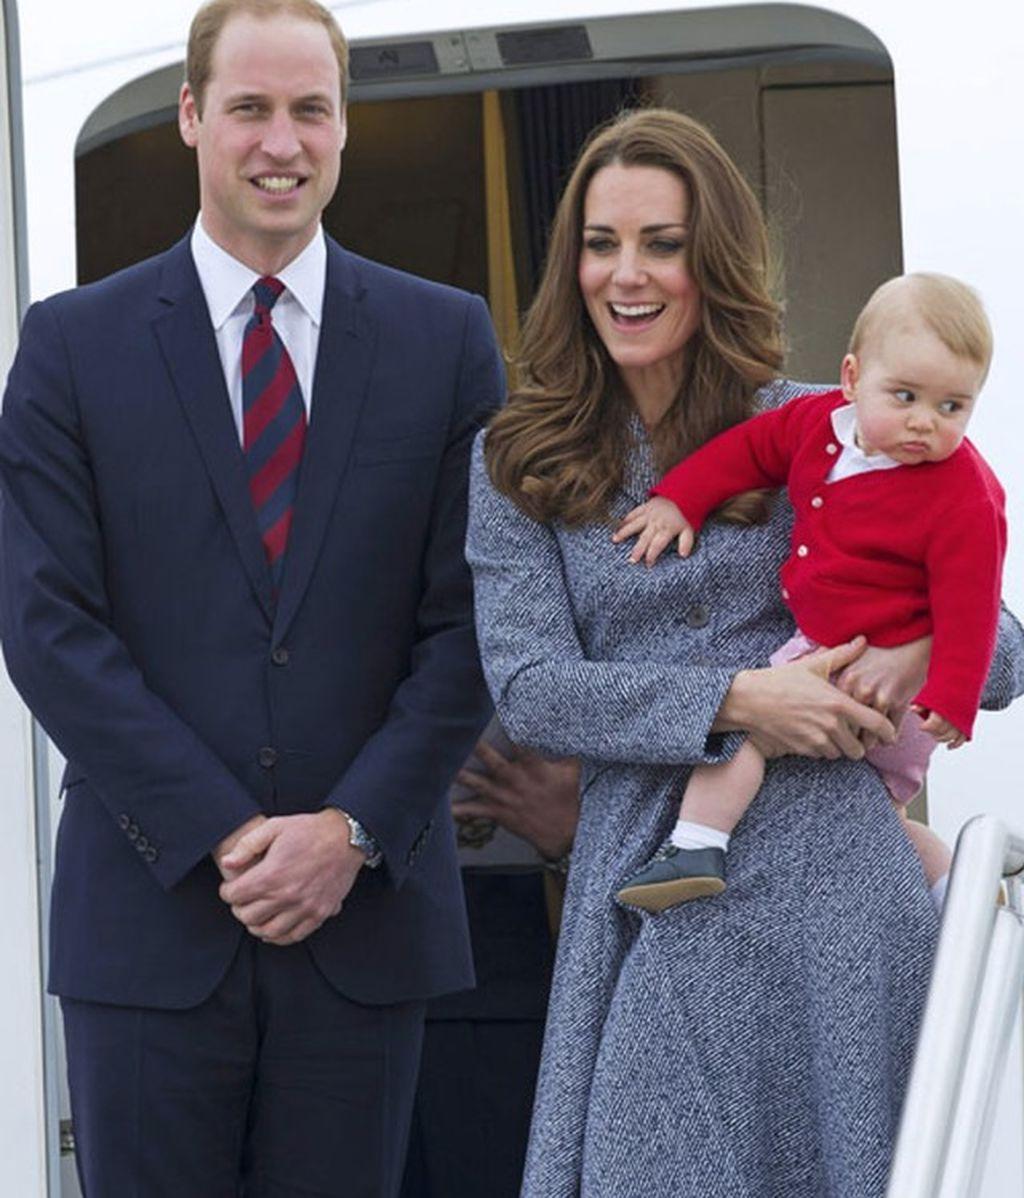 Un hermano para George: ¡Kate Middleton será mamá por segunda vez en primavera!